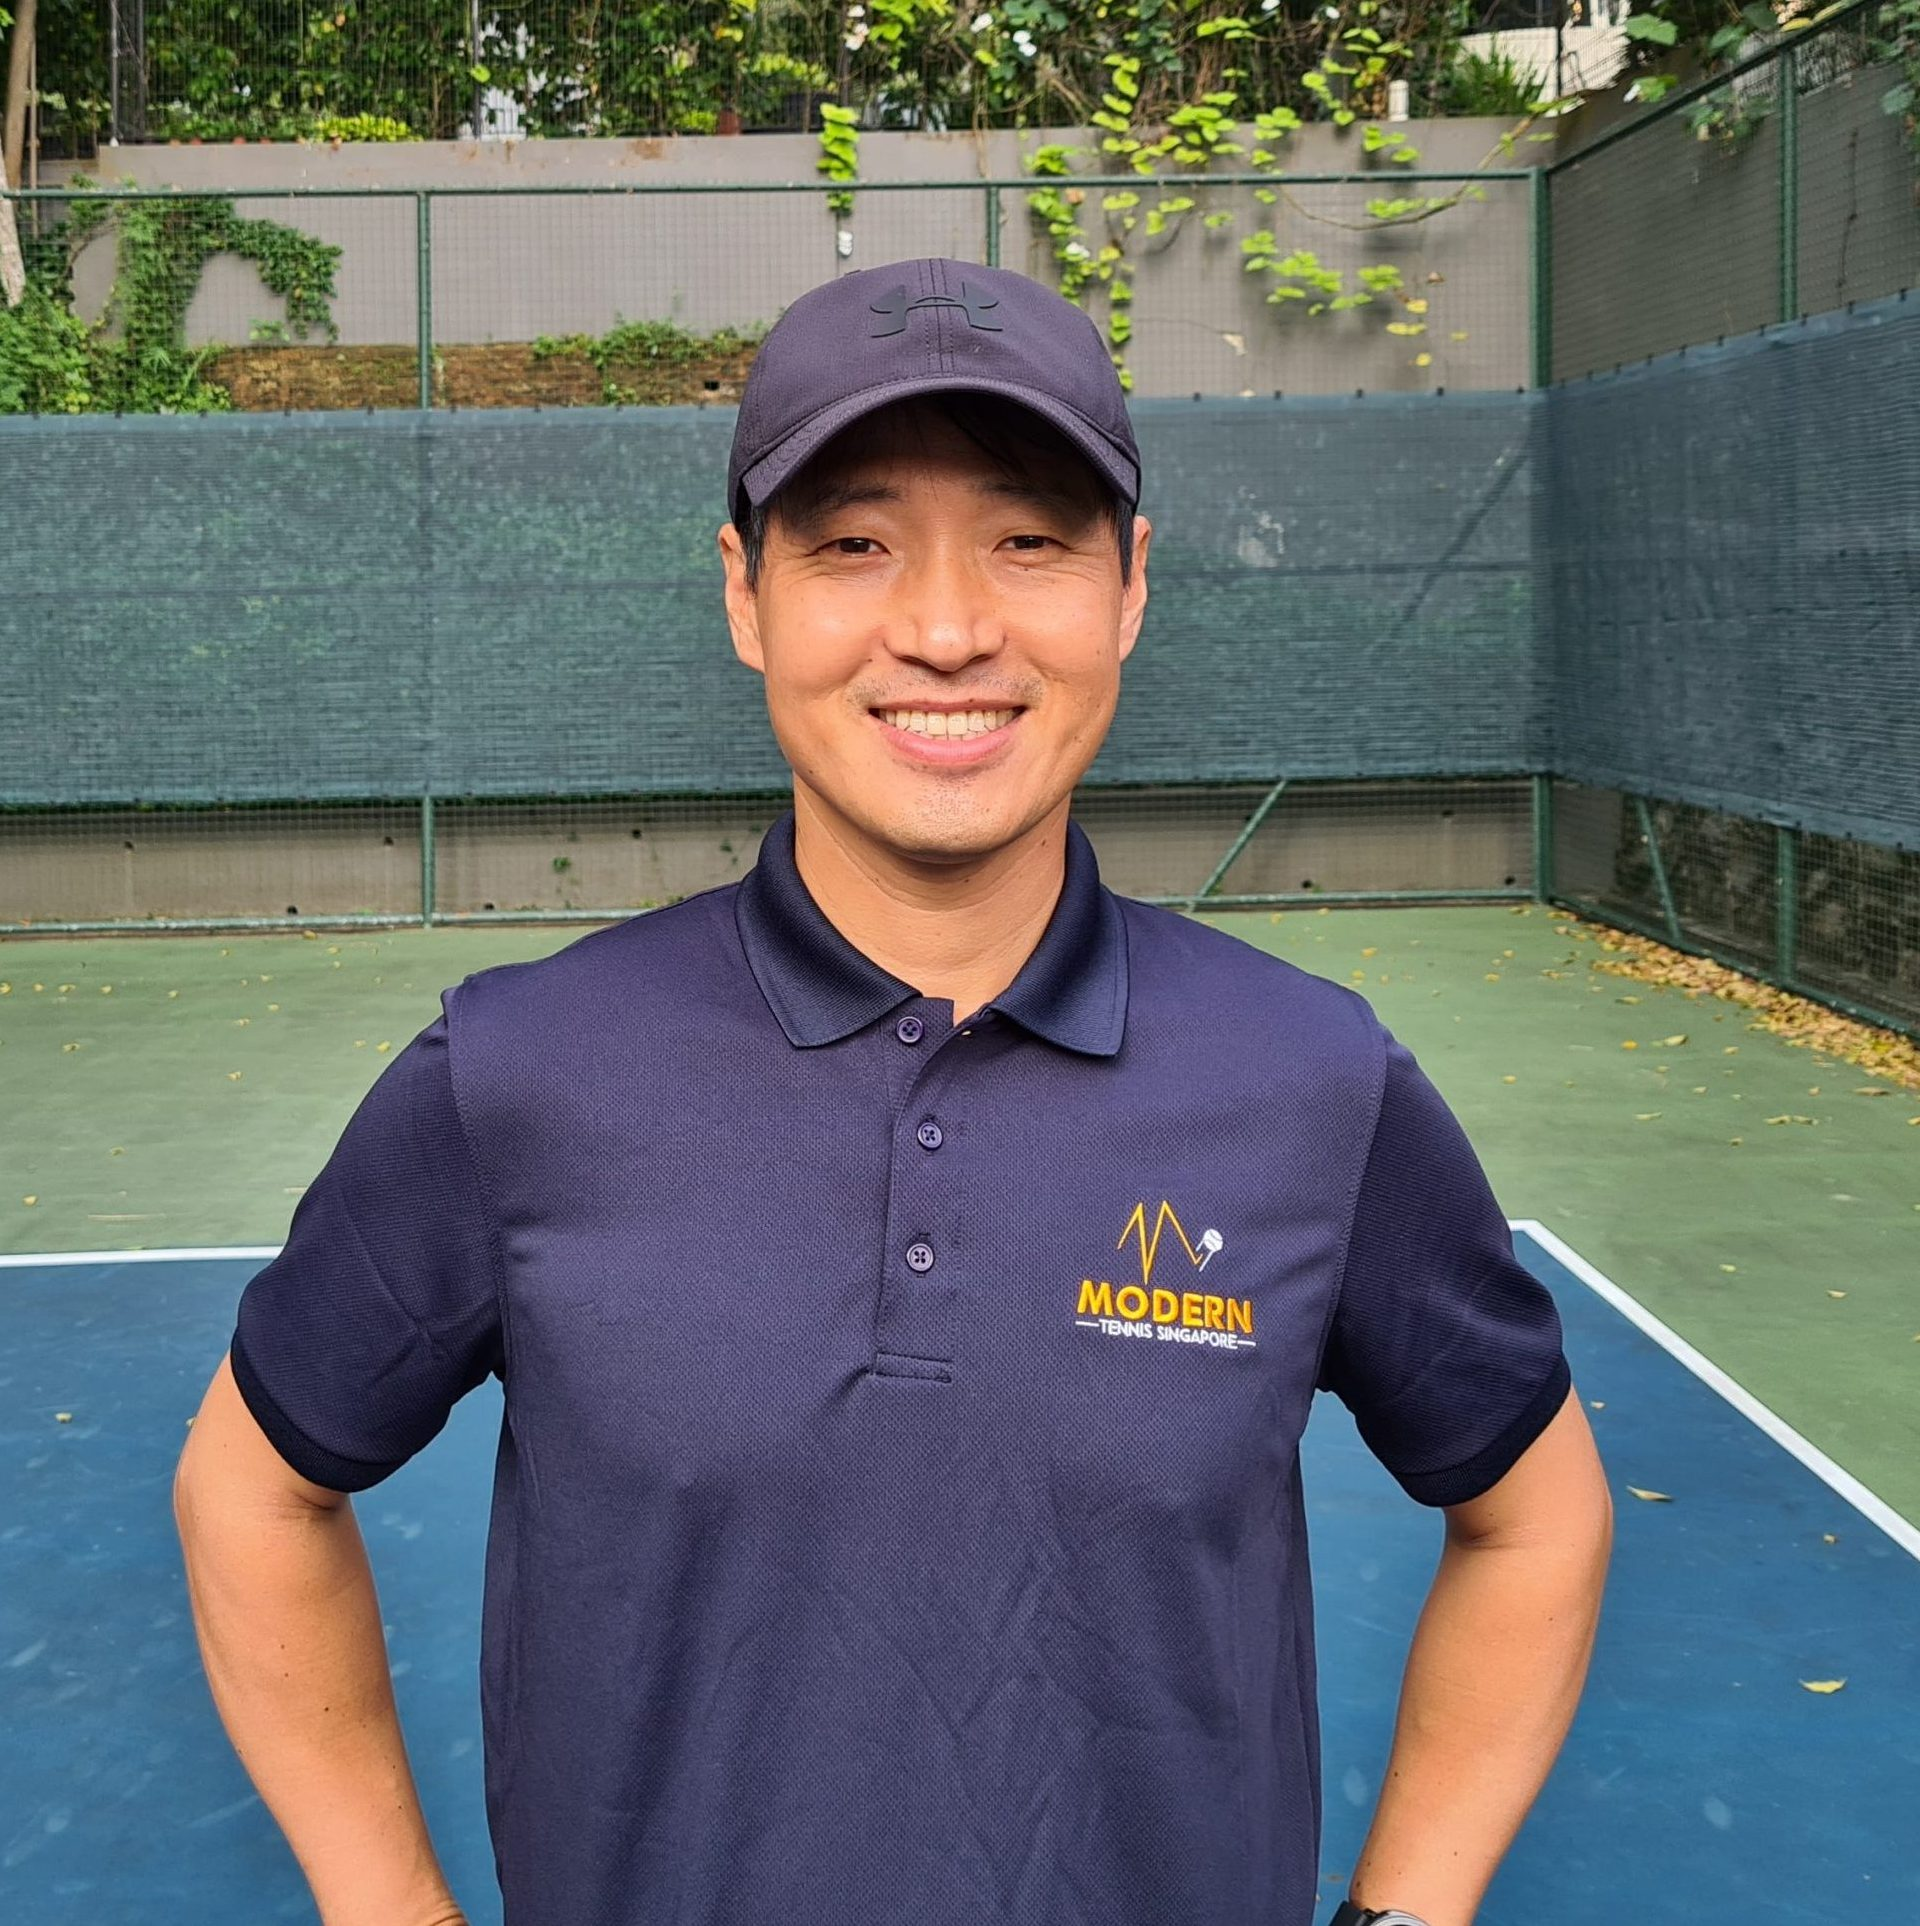 Coach James - Modern Tennis Singapore